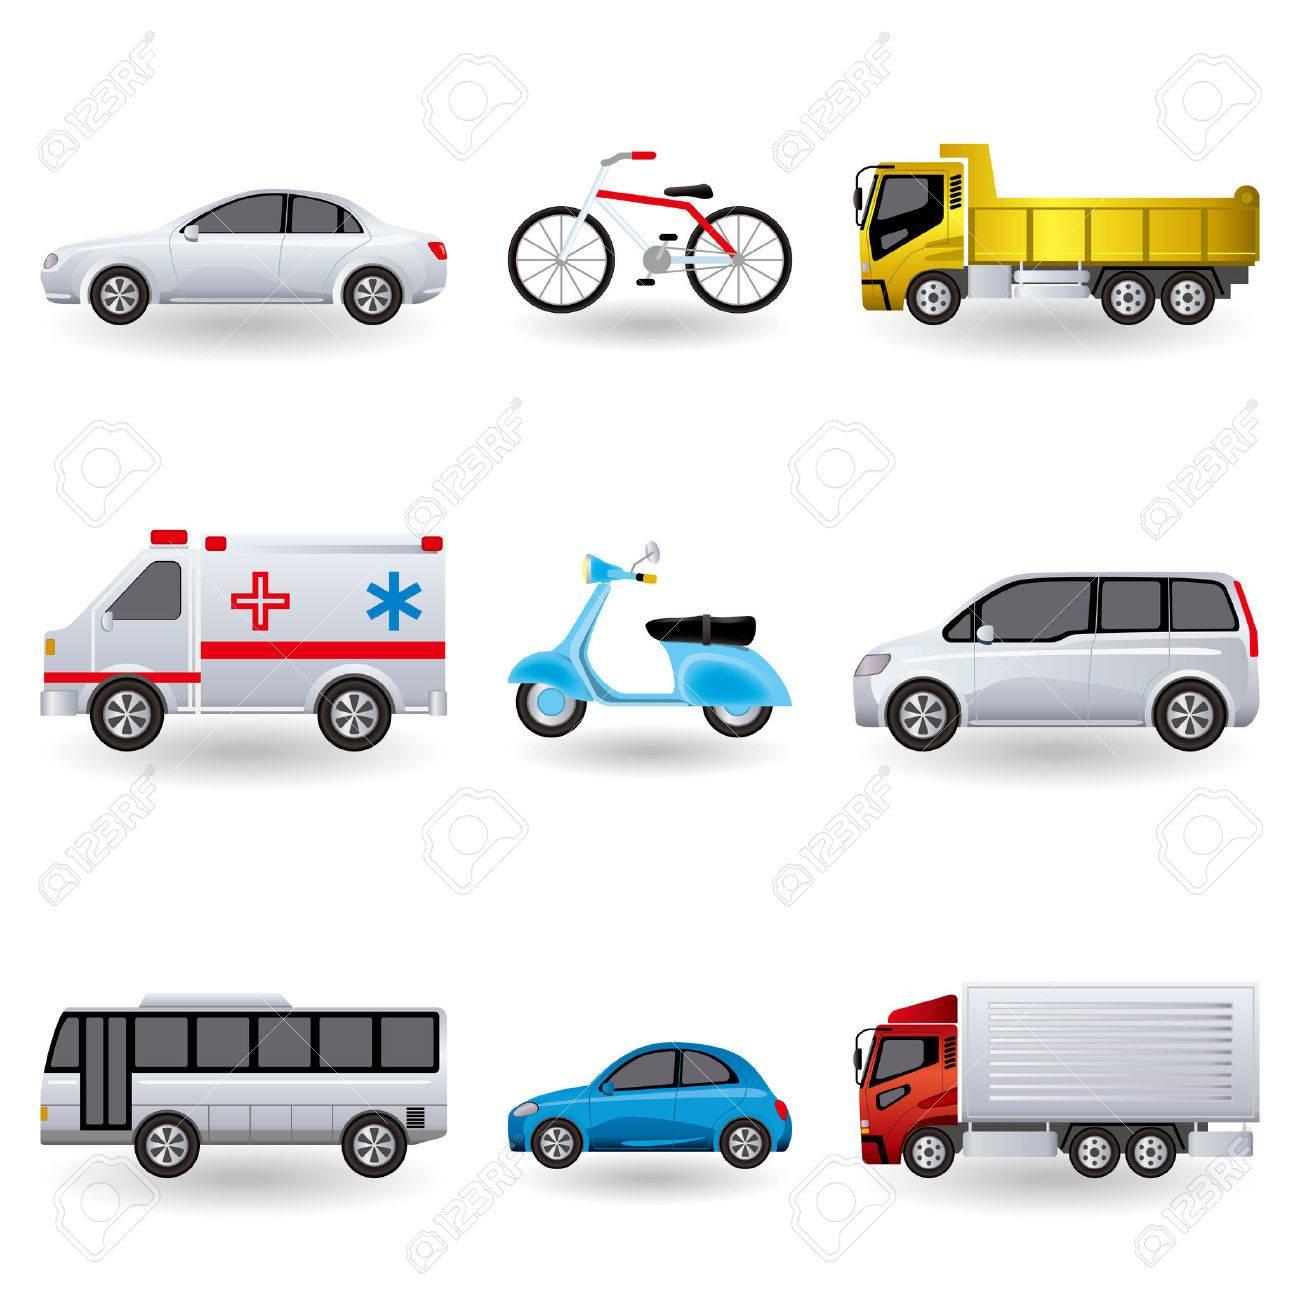 Realistic transportation icons set. Illustration Stock Vector - 7775324